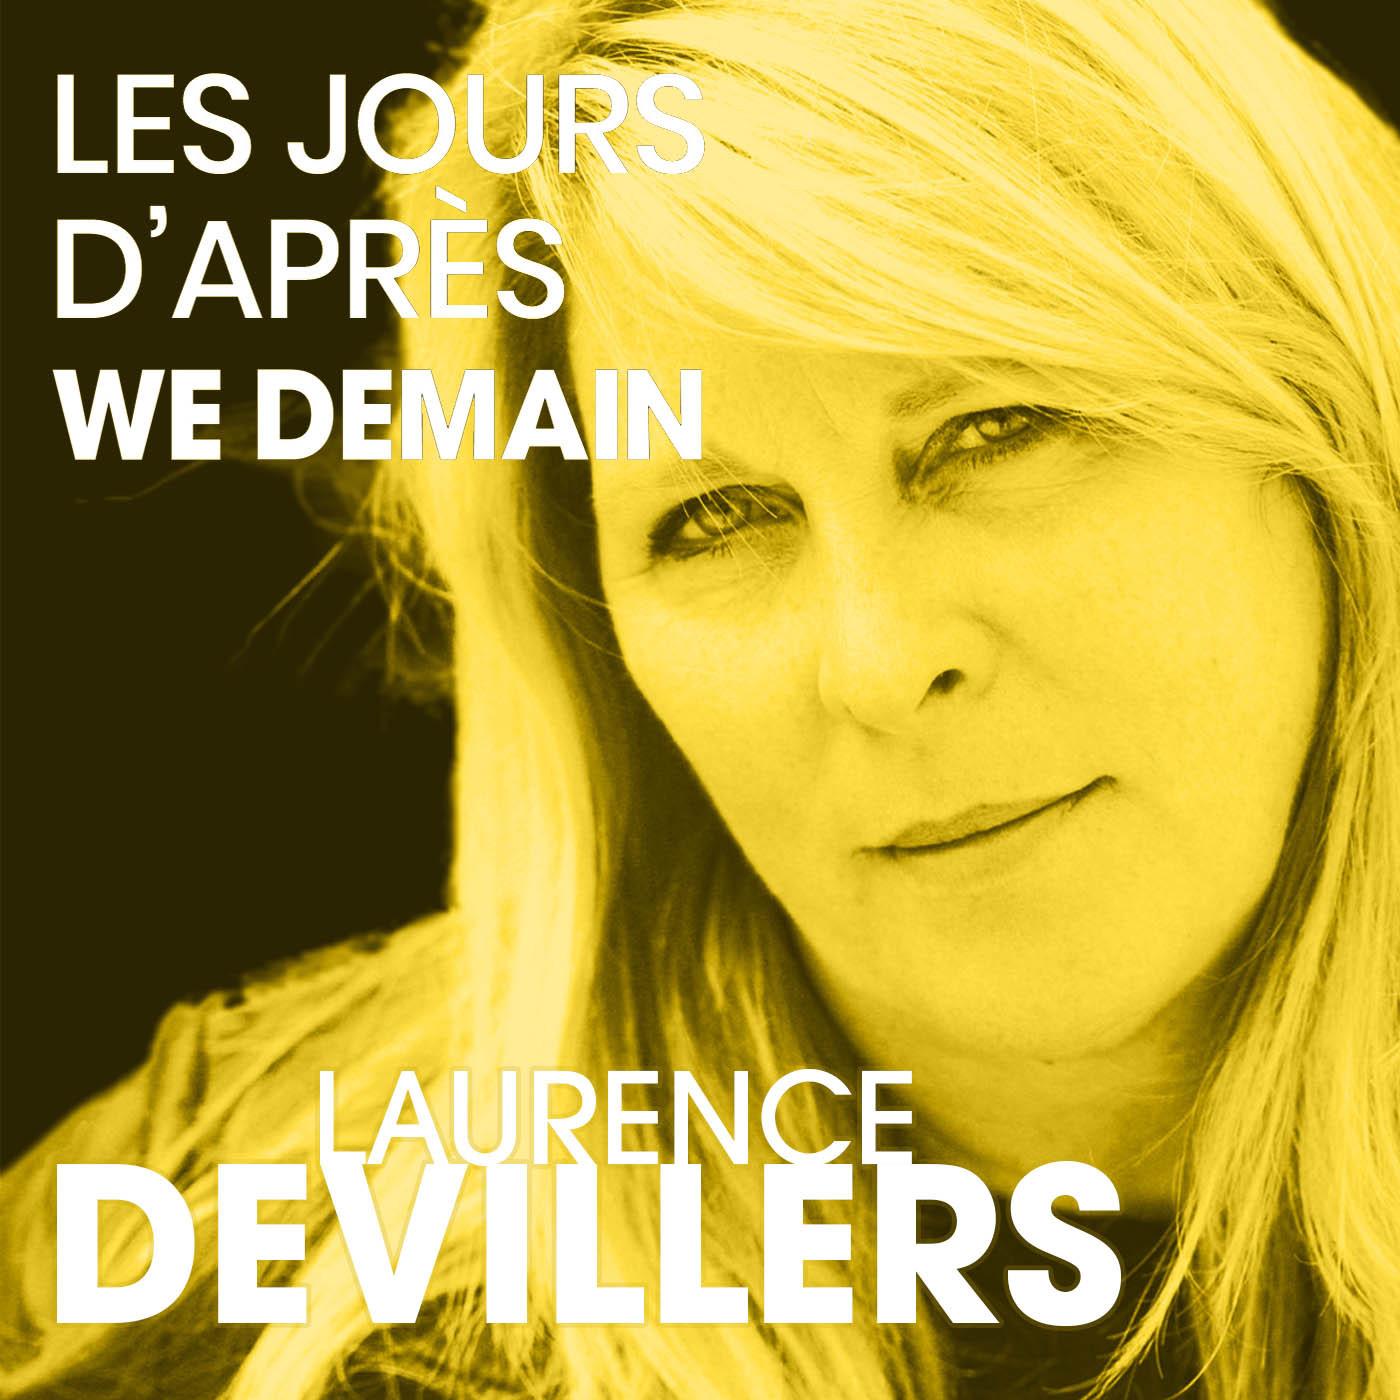 Laurence Devillers